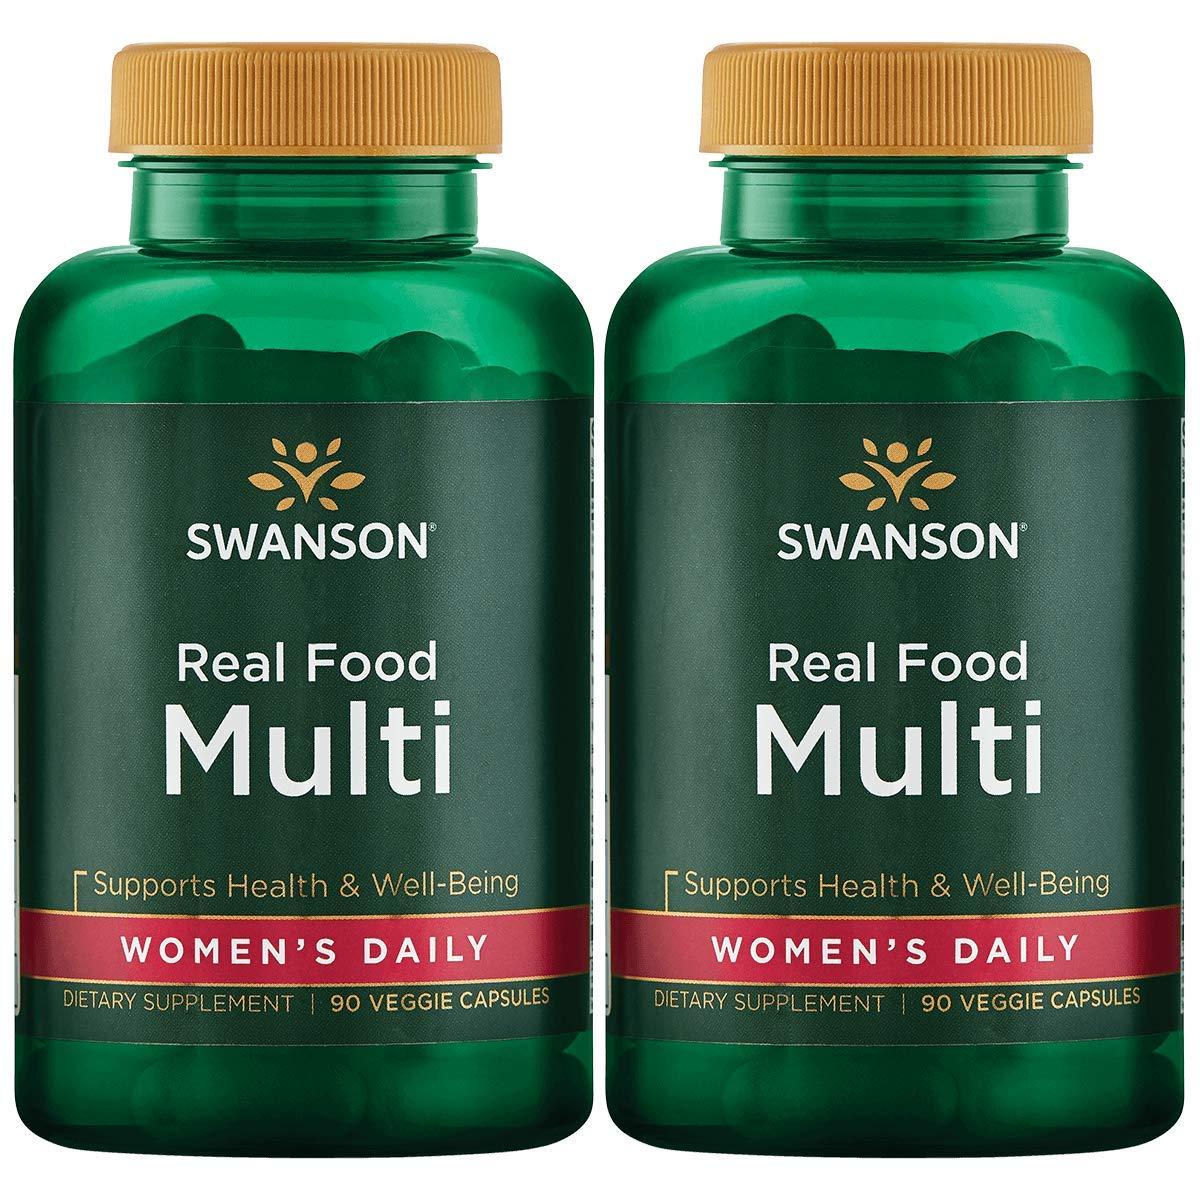 Real Food Multi Women's Multivitamin Multimineral Women's Health Urinary Tract Stress Response Bone Hair Skin Nails Support Supplement Vegan Gluten-Free Non-GMO 90 Veggie Capsules Veg Caps (2 Pack)